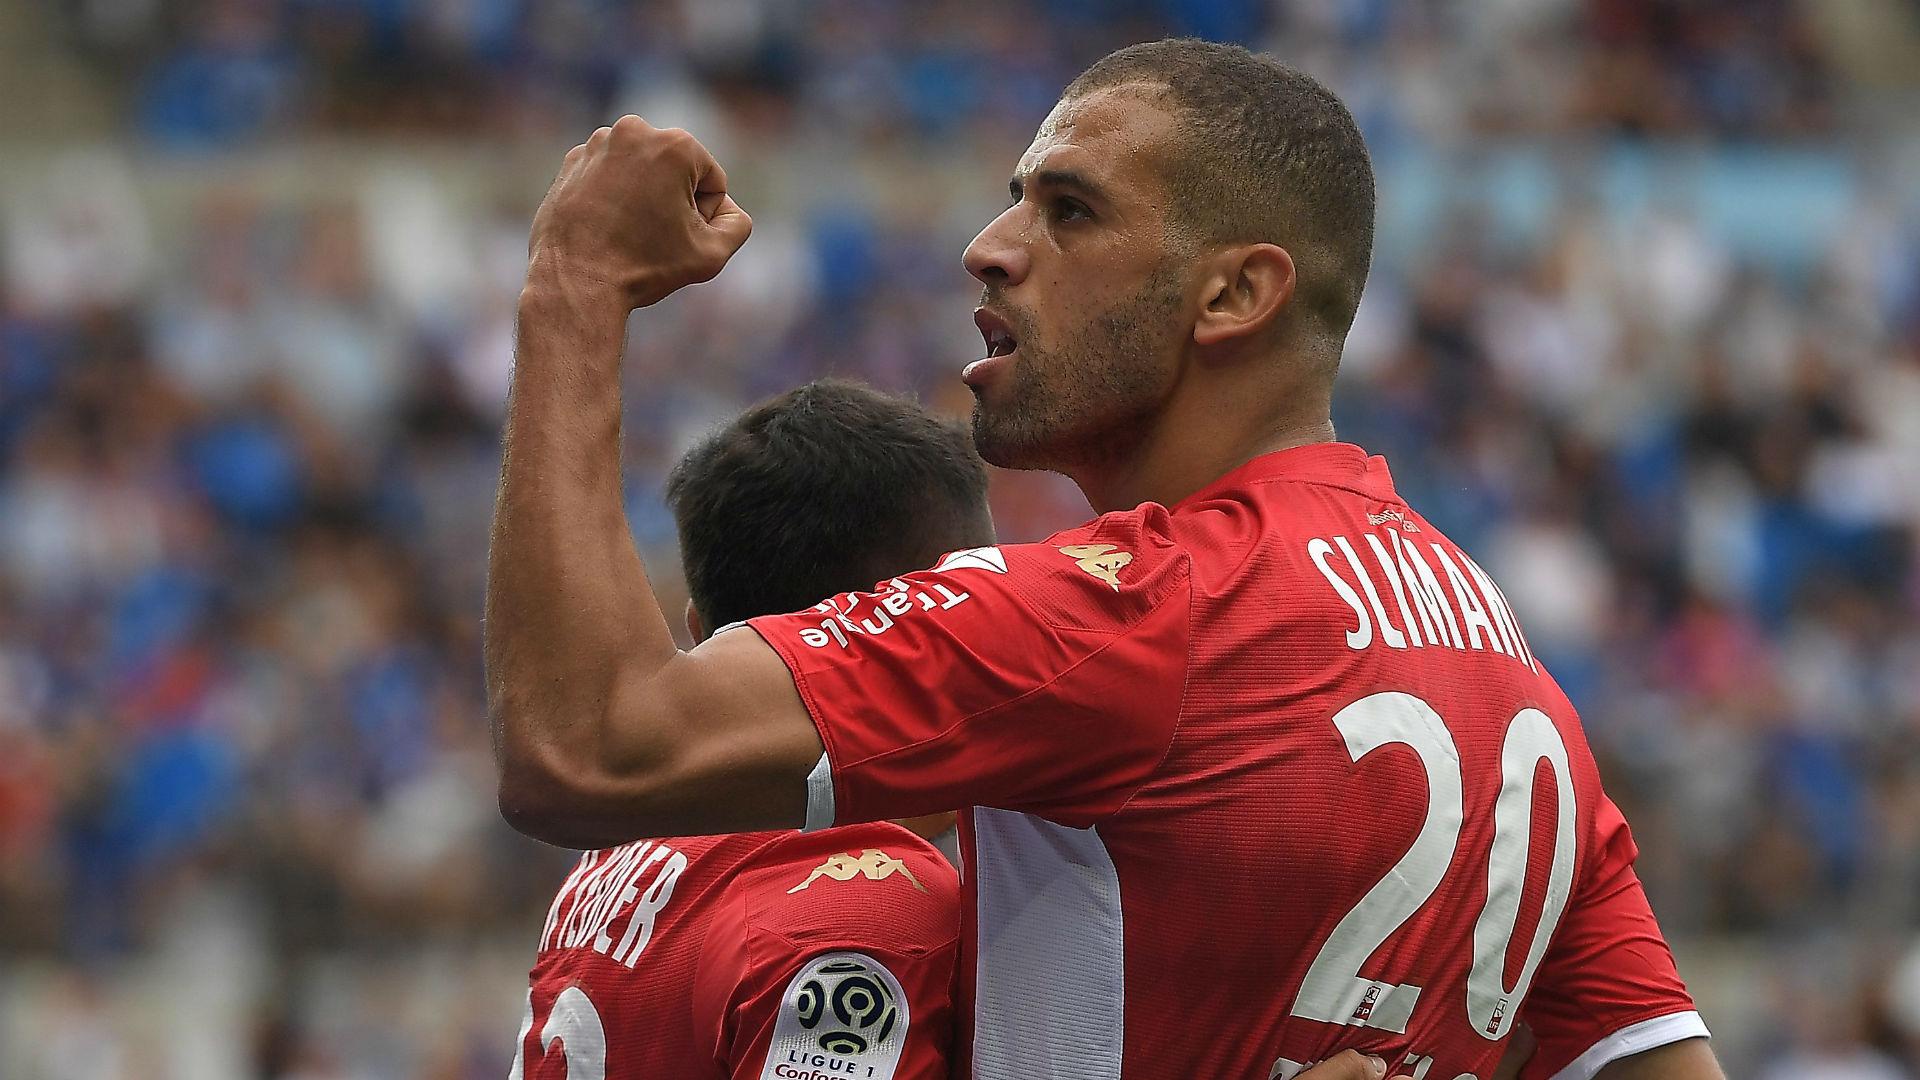 Monaco boss Moreno underlines Slimani's importance after Montpellier display